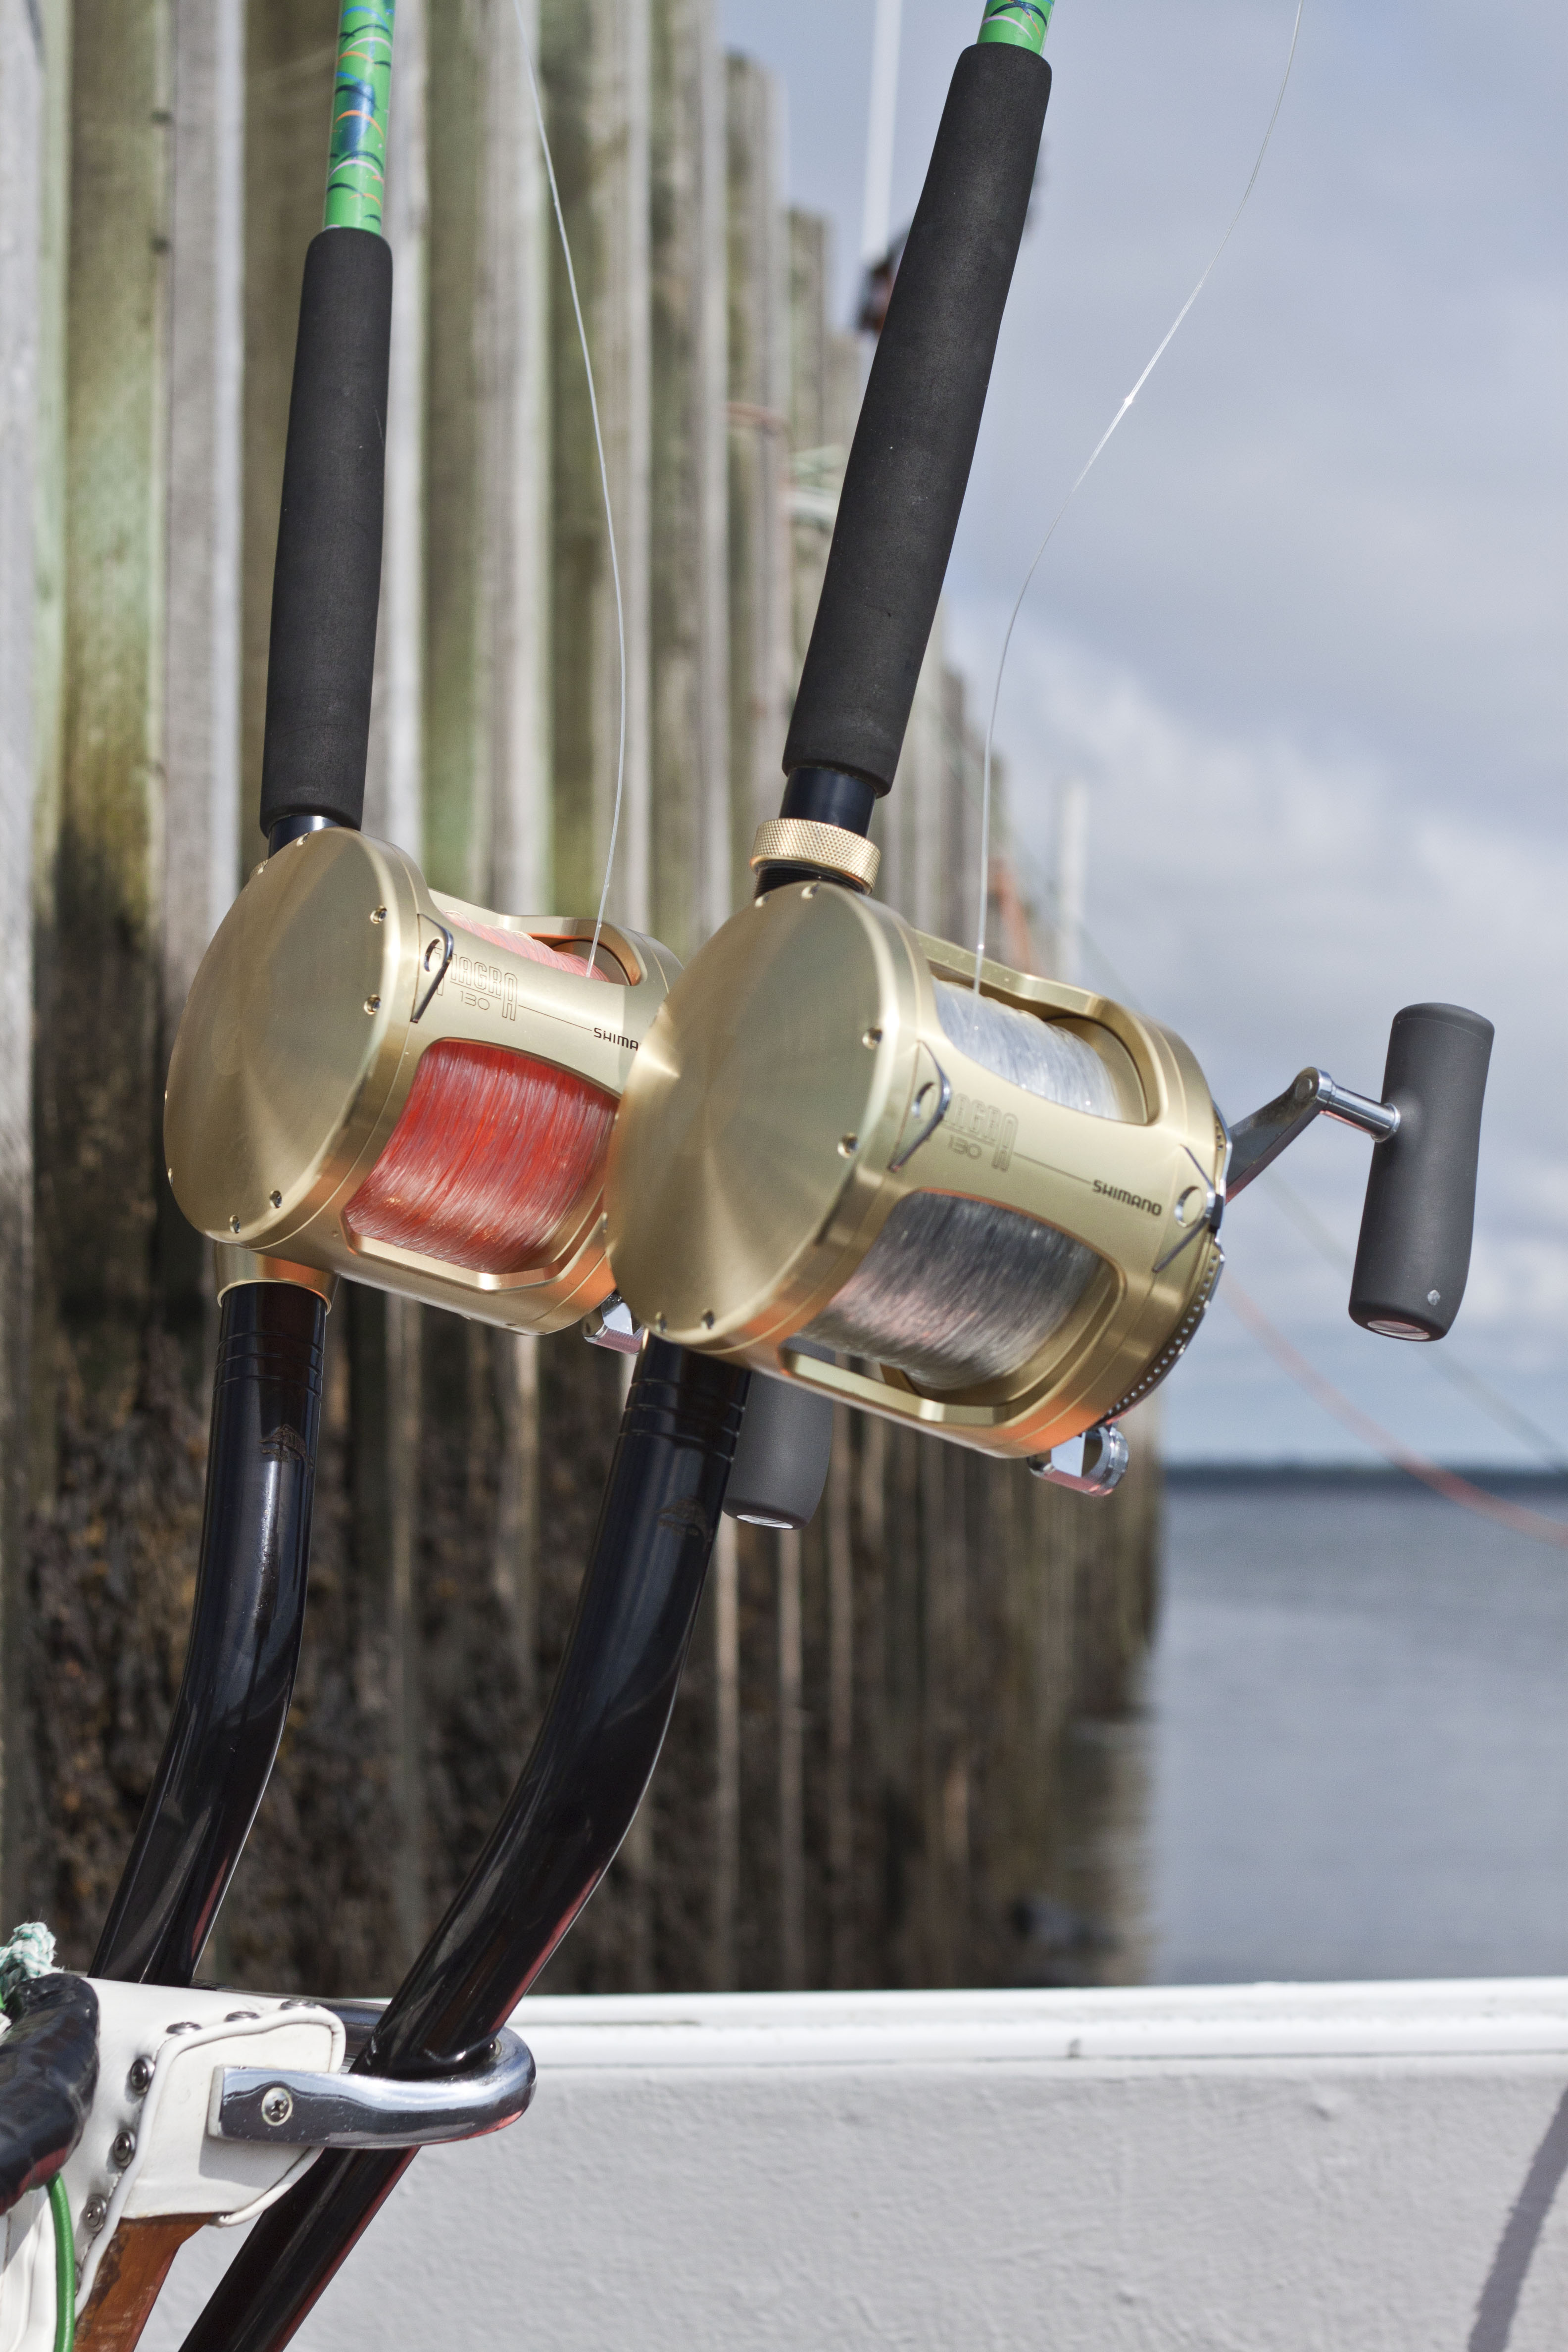 Nova Scotia Bluefin Tuna Fishing / A Thousand Threads